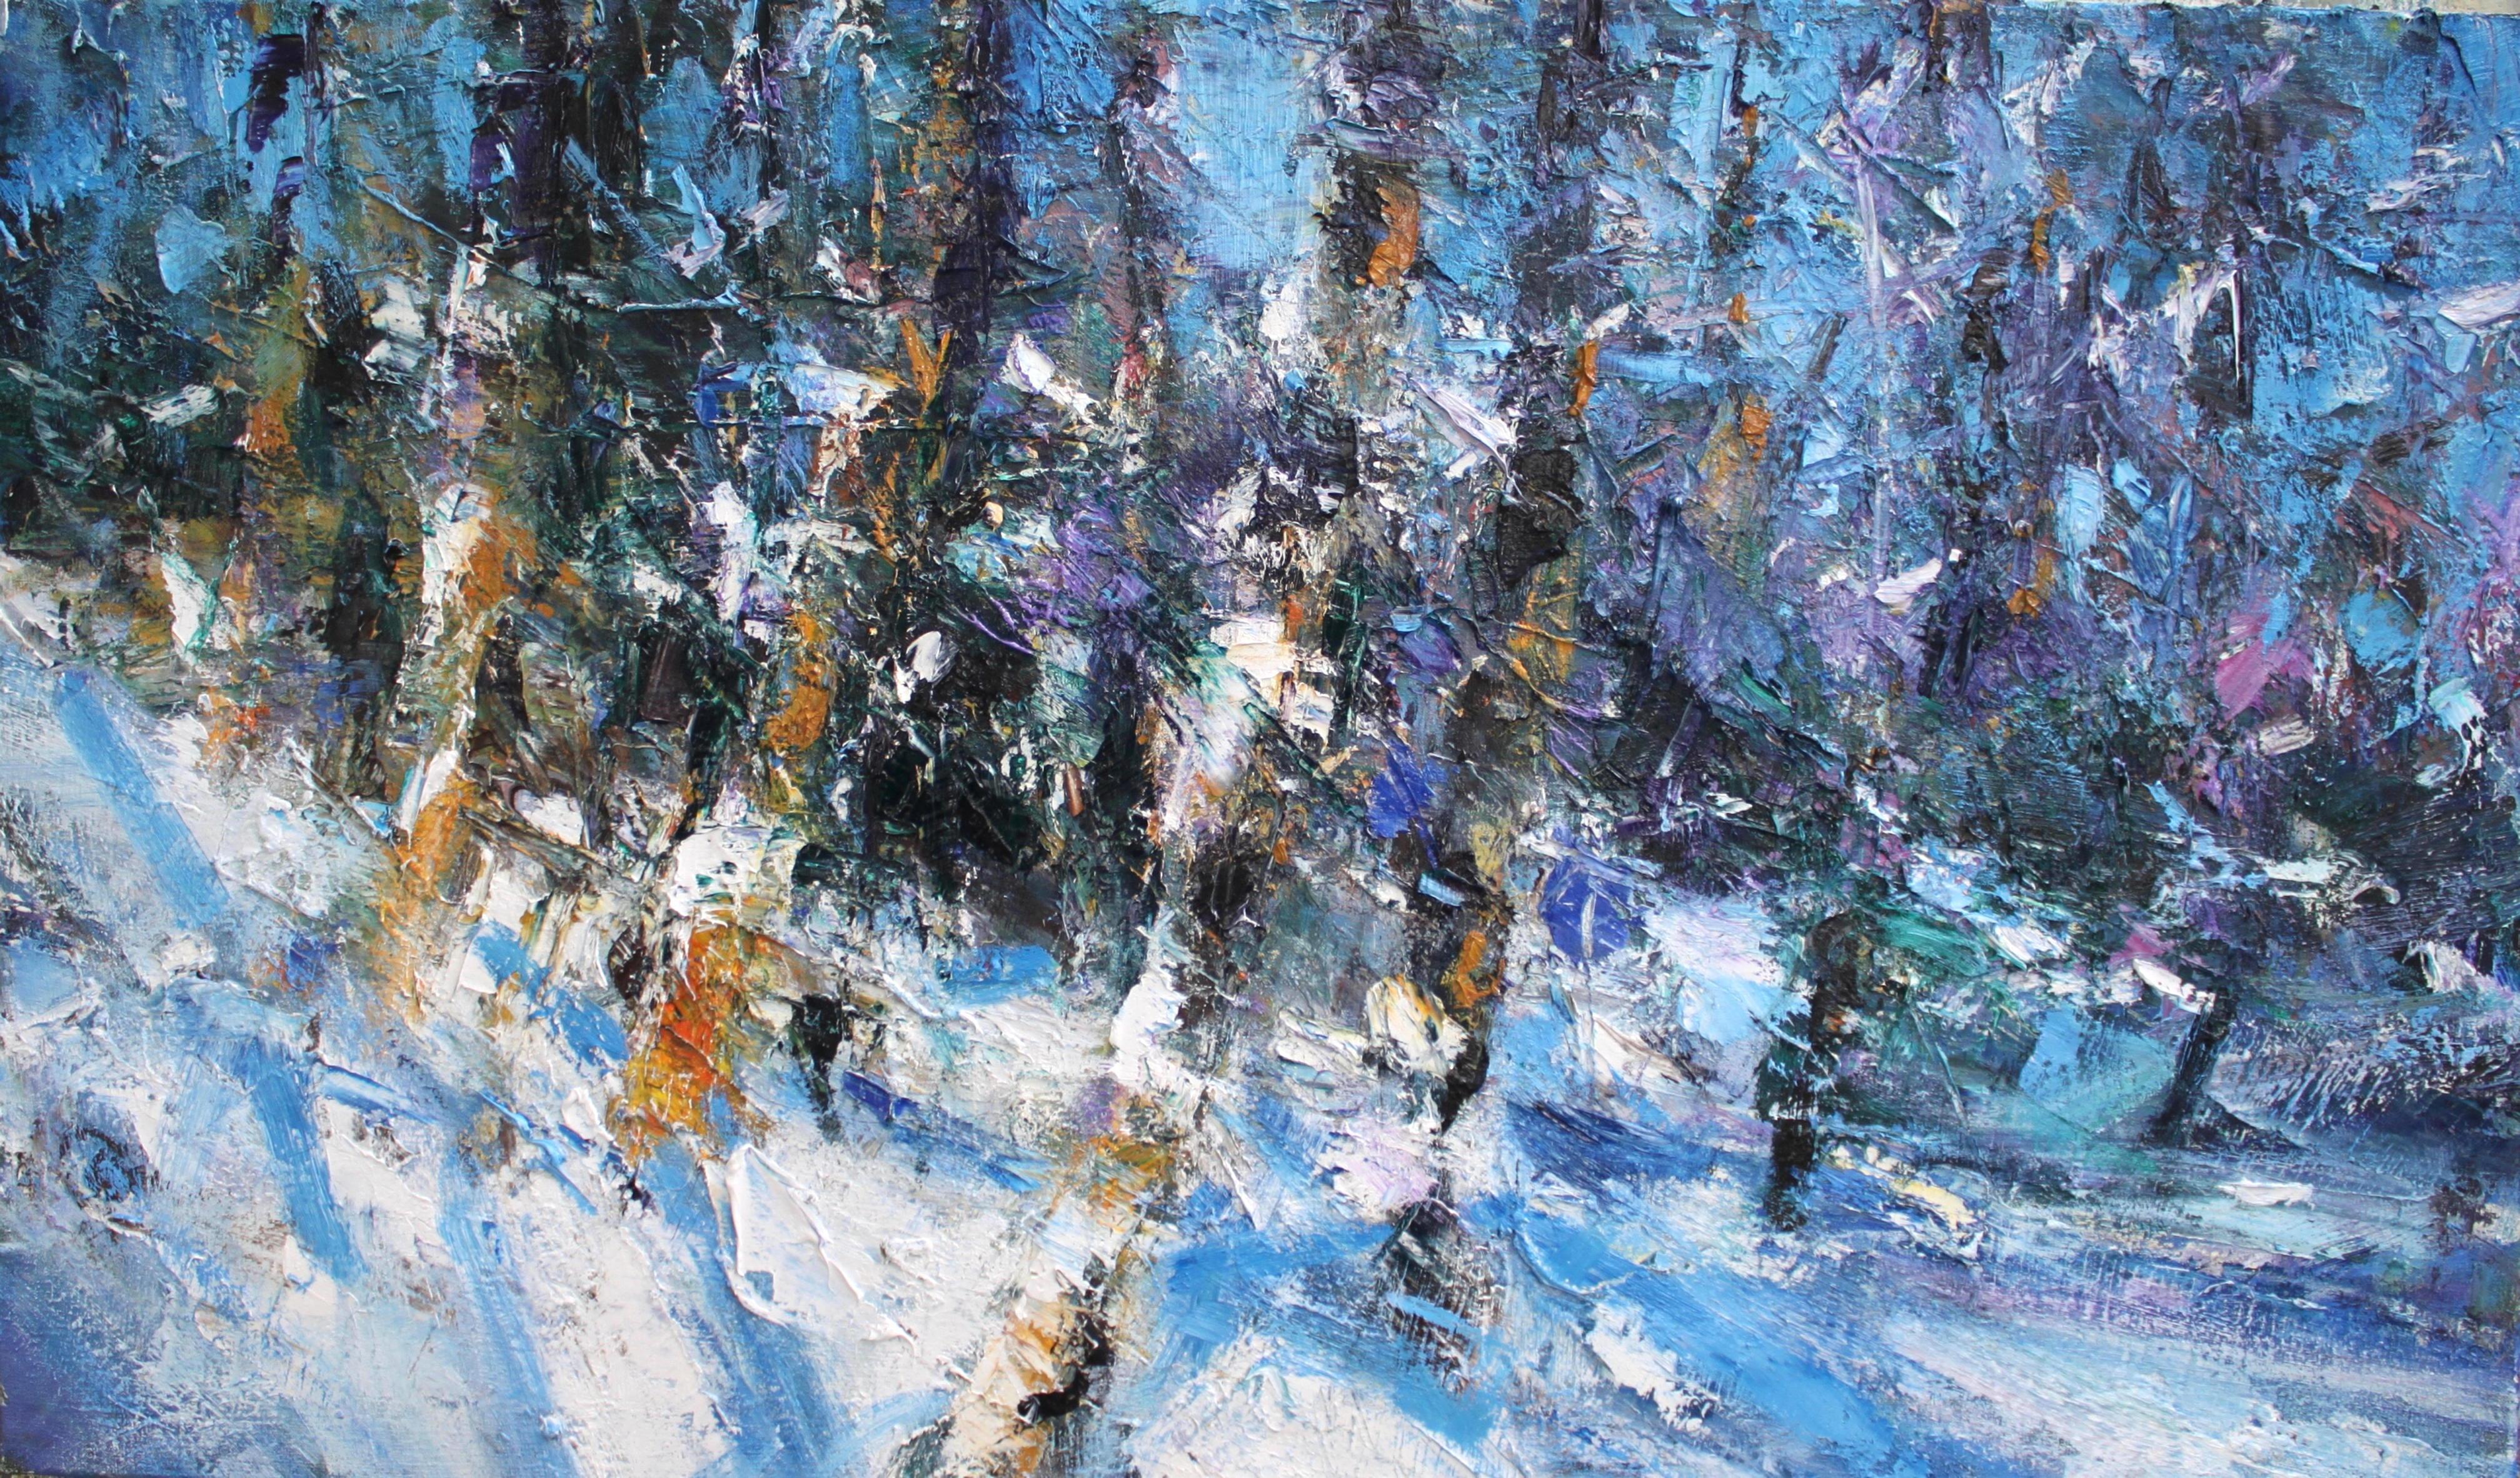 Winter Illumination - Scottish Landscape Painting